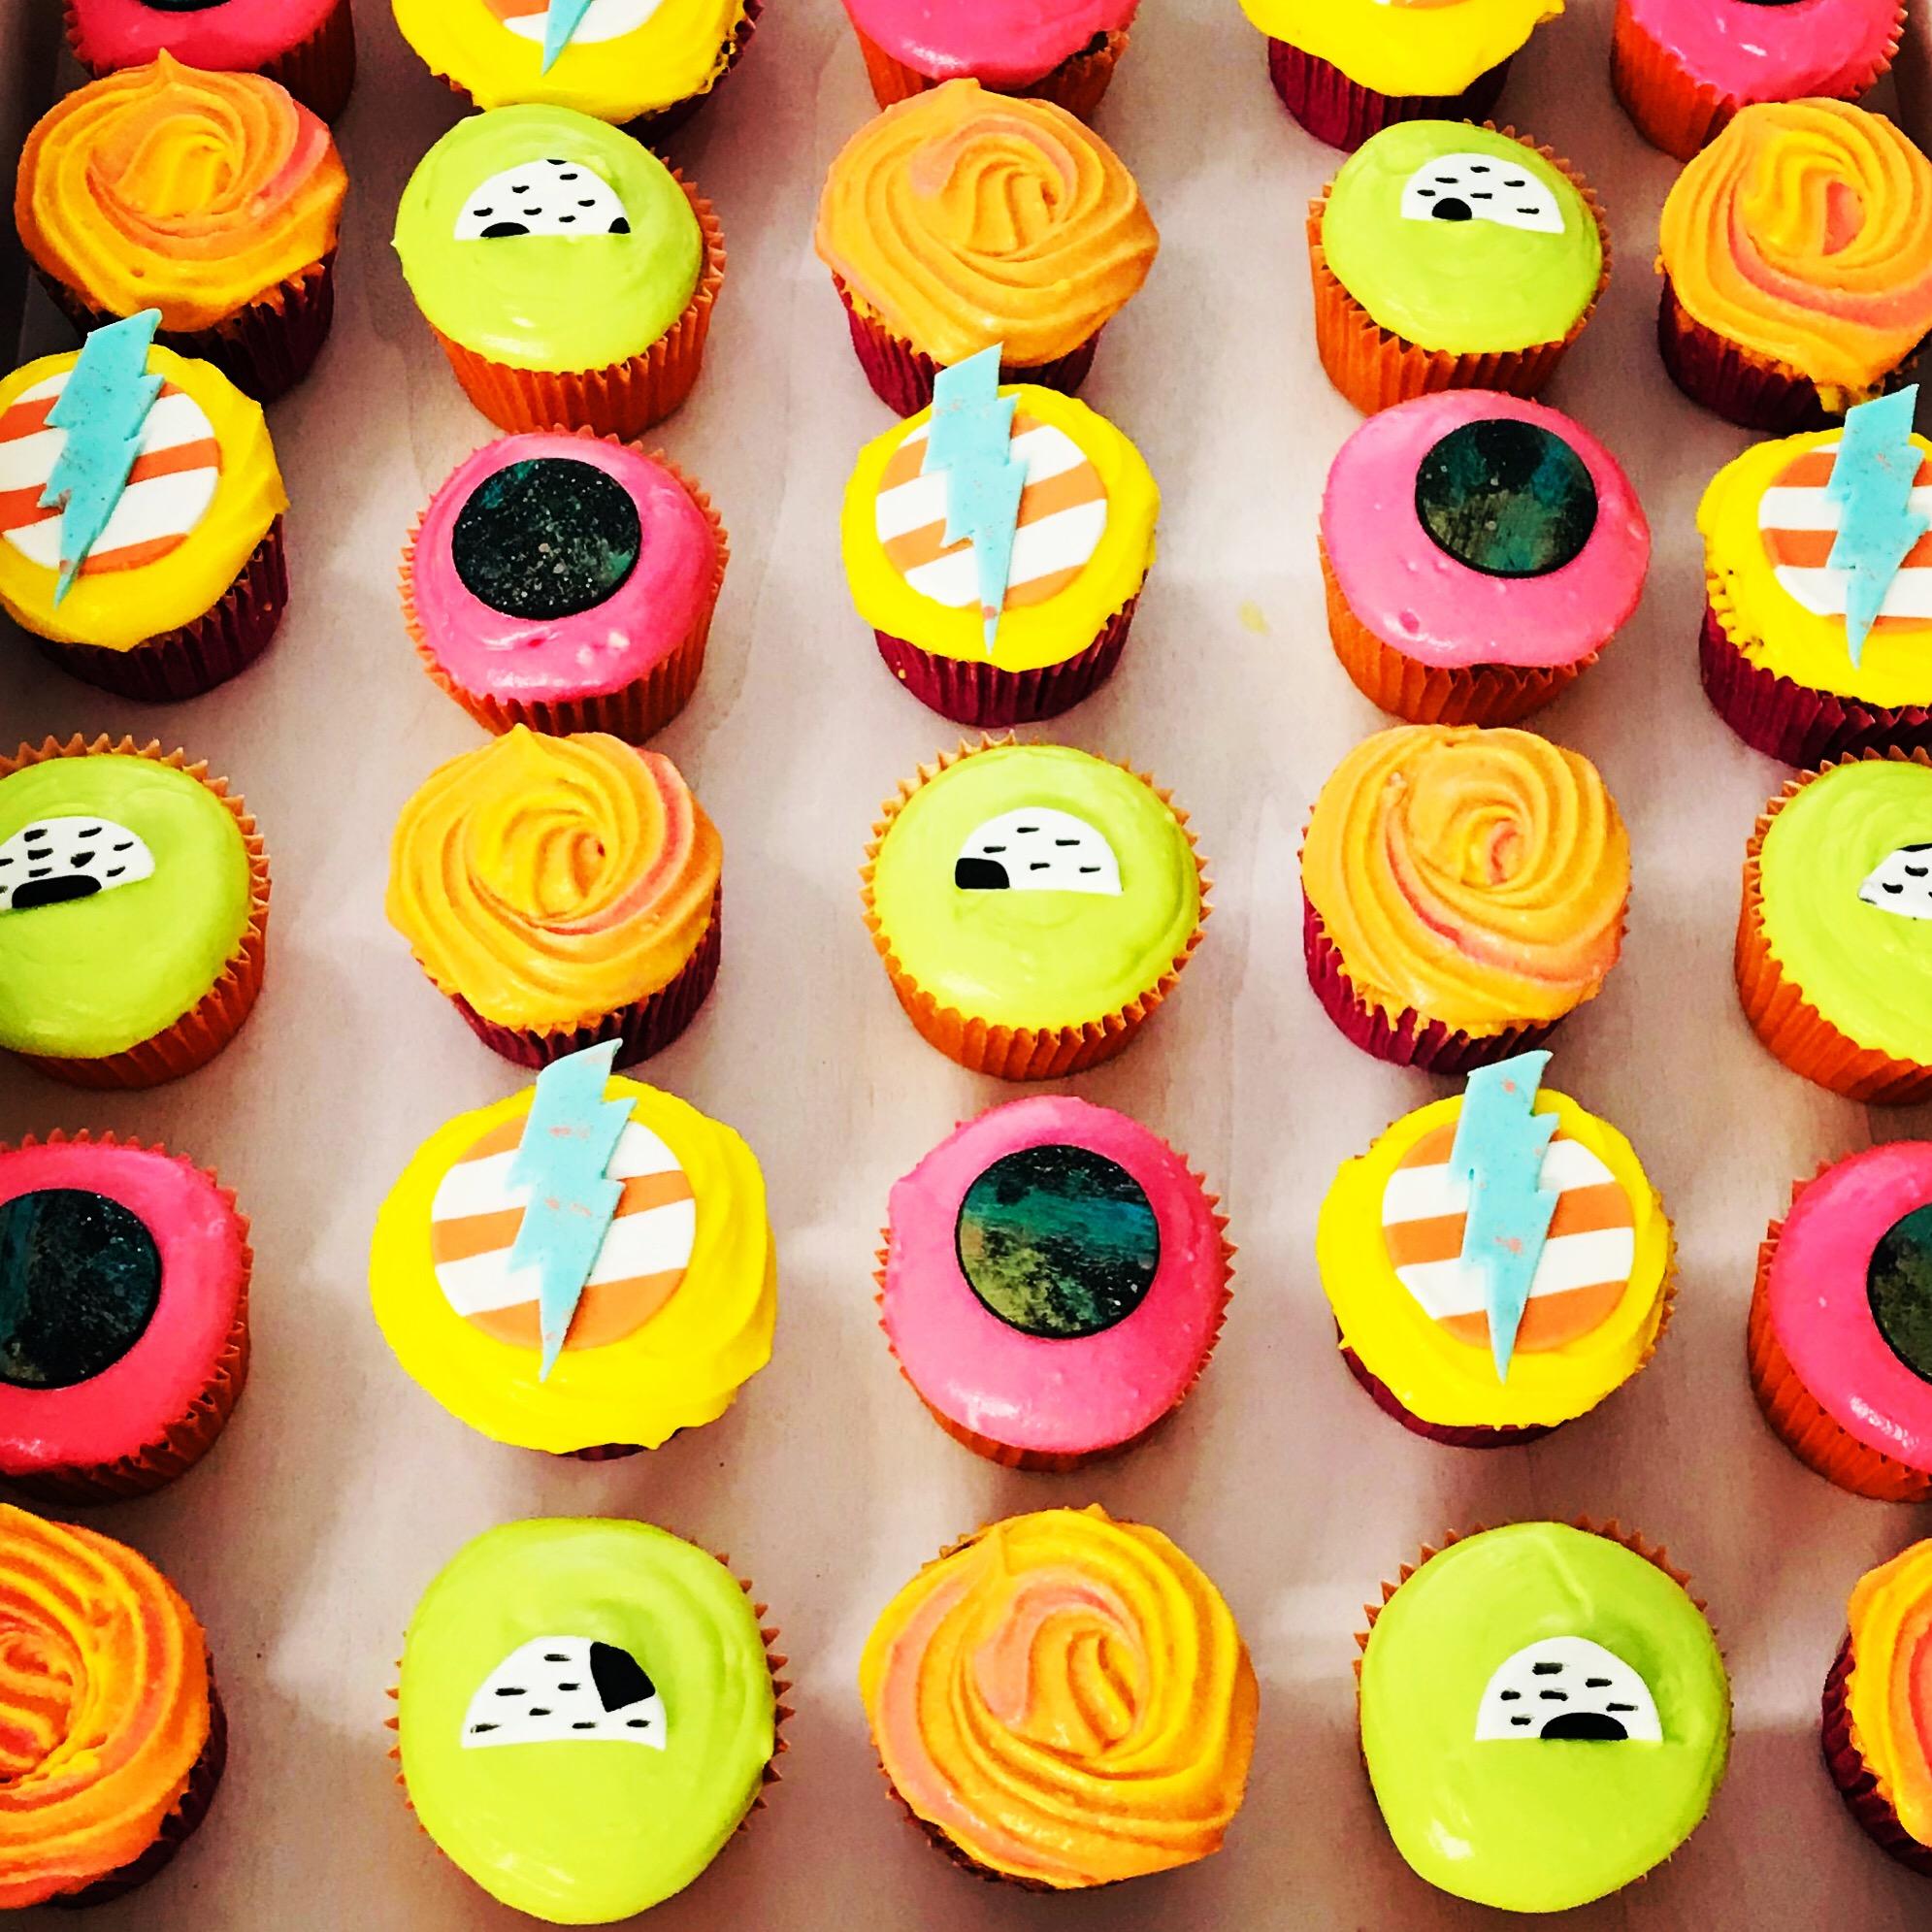 80s neon corporate cupcakes